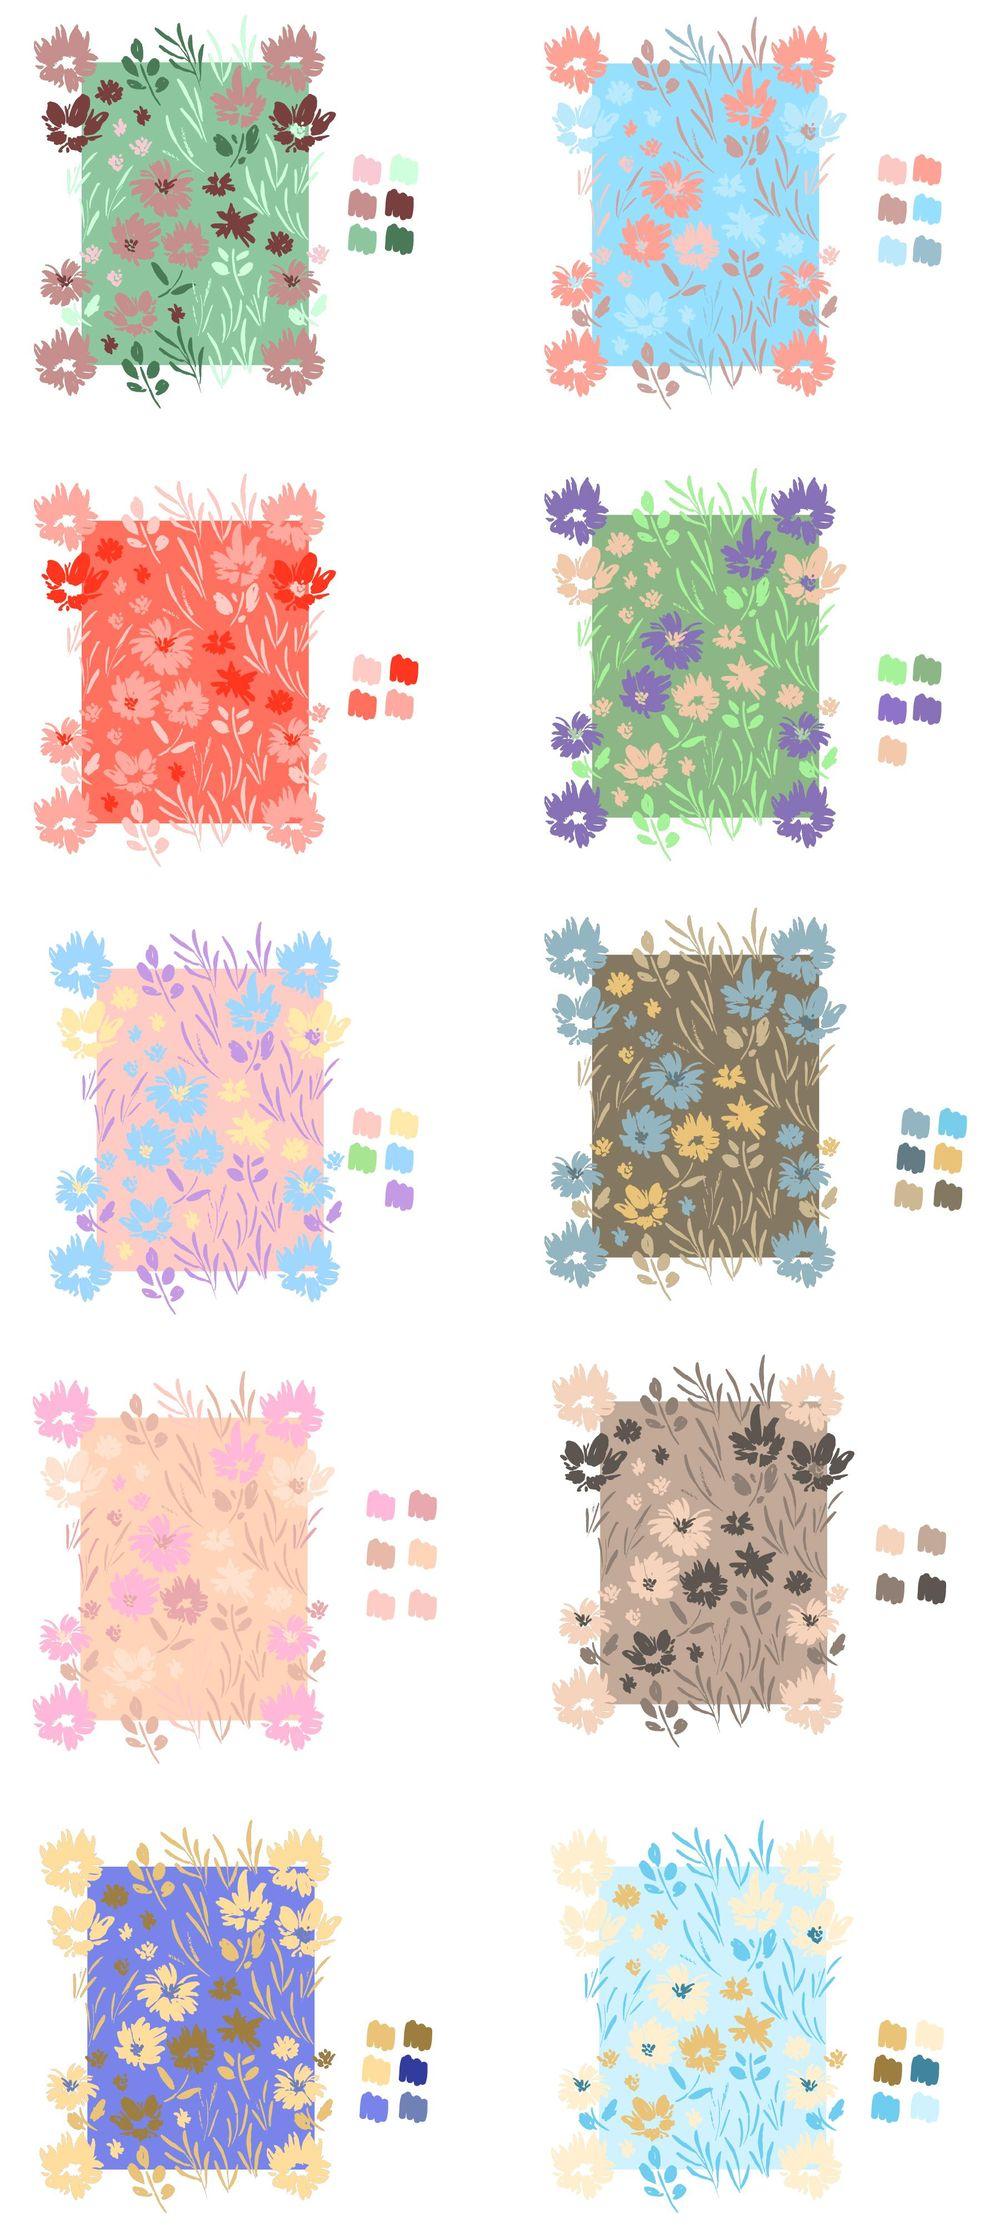 Creativ Color - Hanna Karakai - image 1 - student project